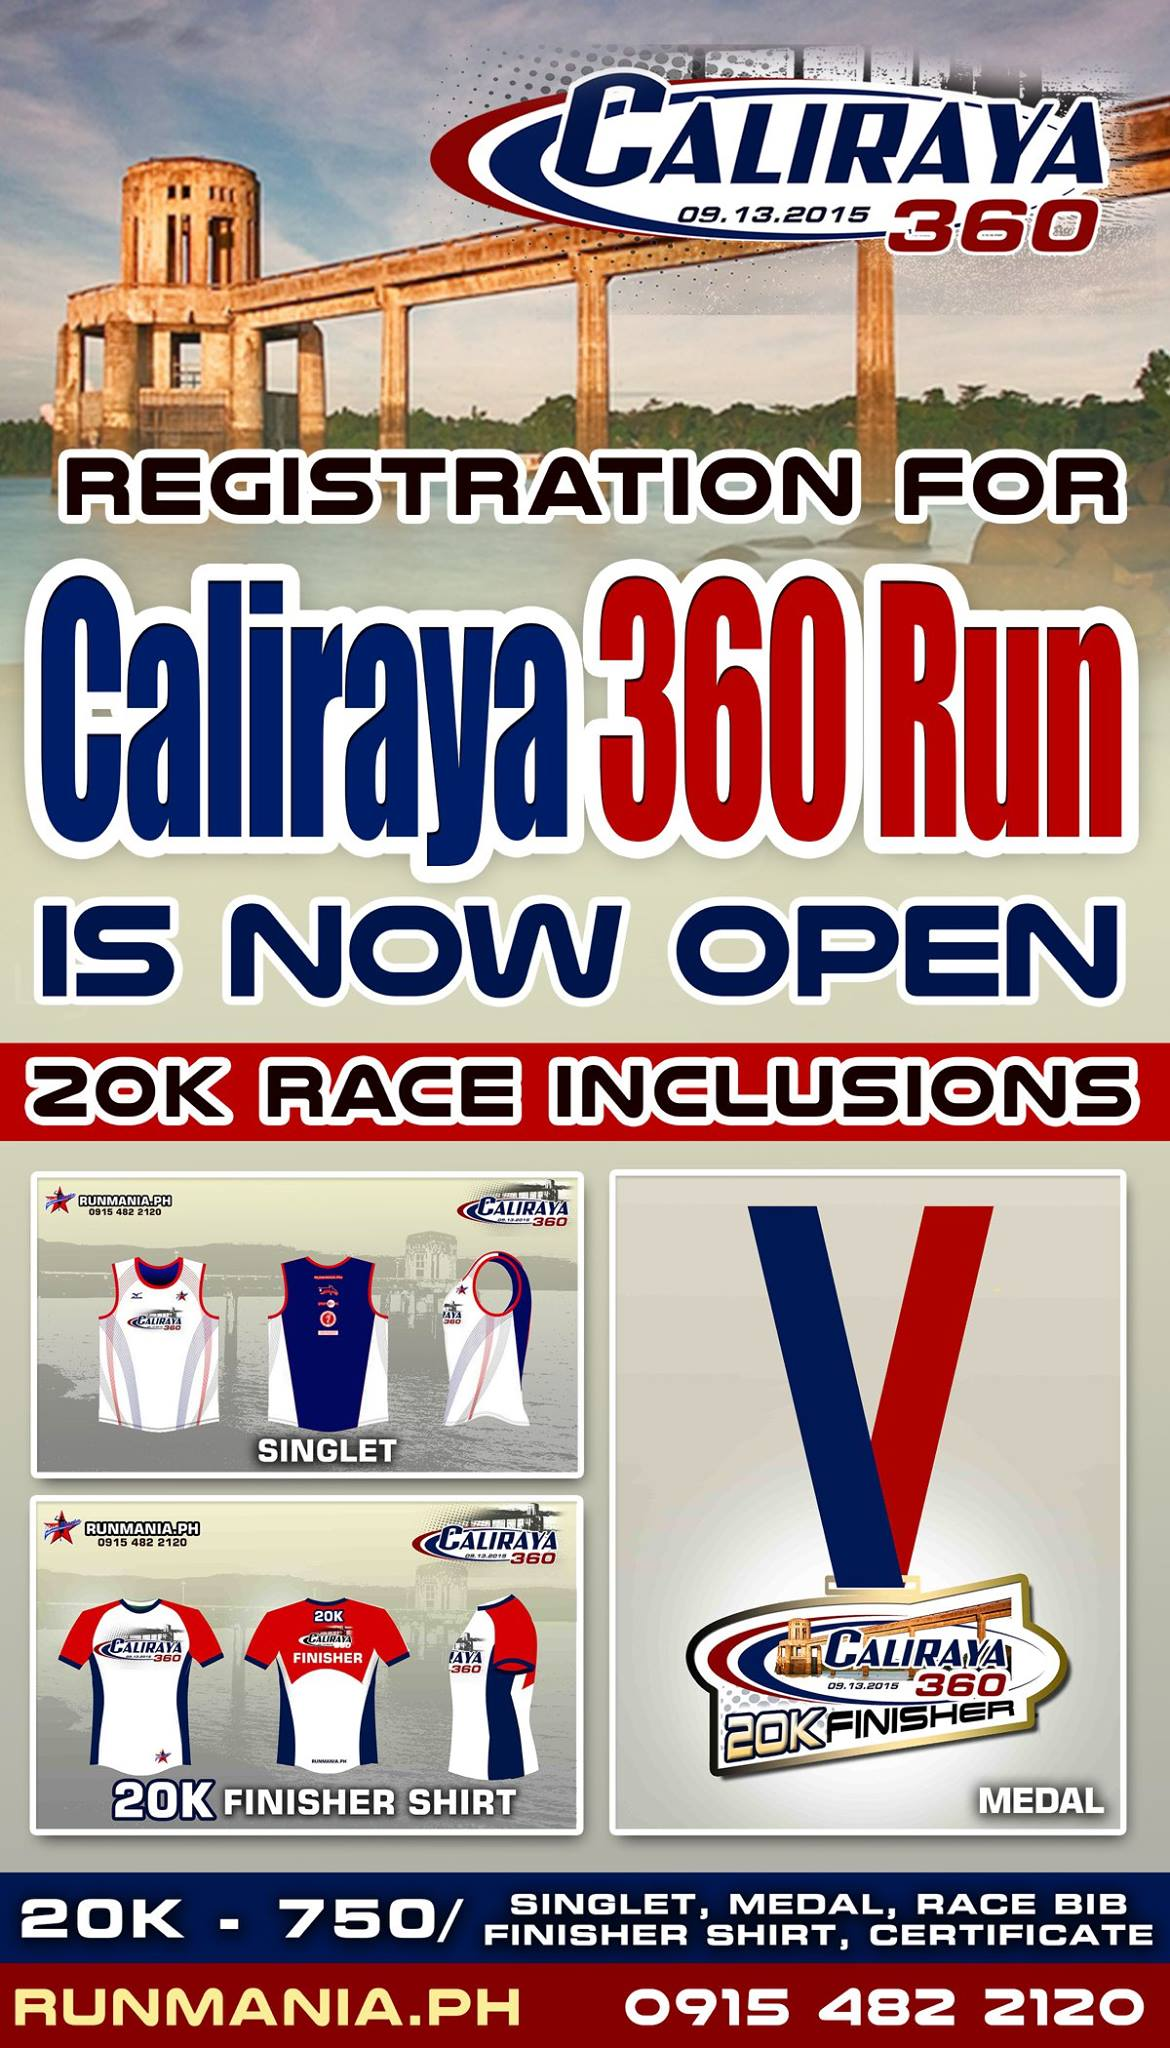 Caliraya 360 Run 2015 Lumban Laguna Registration